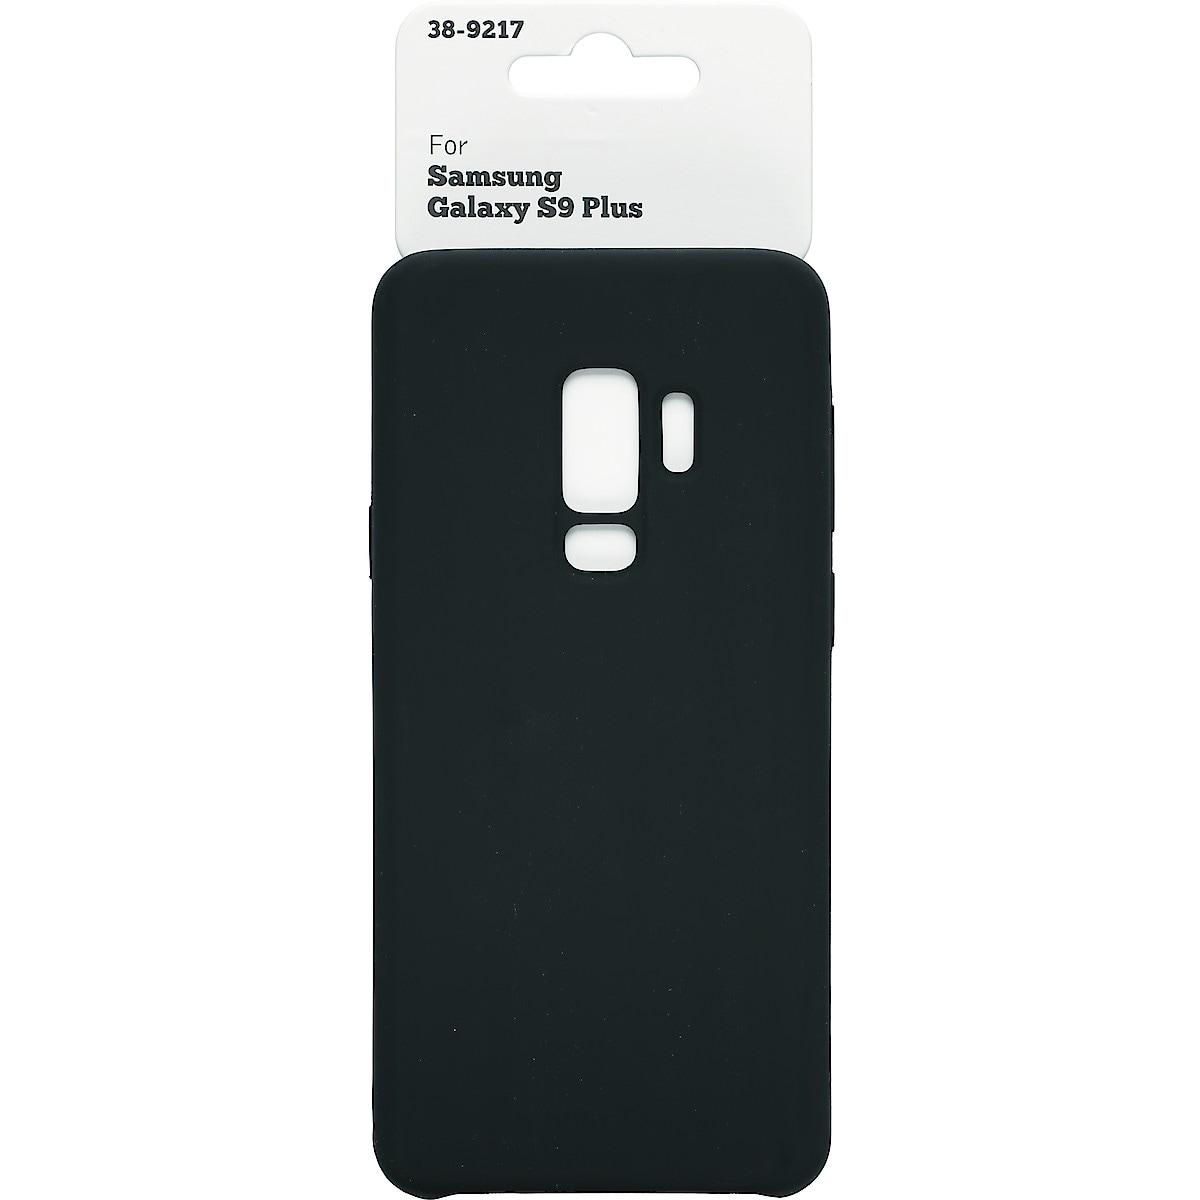 Cover für Samsung Galaxy S9 Plus